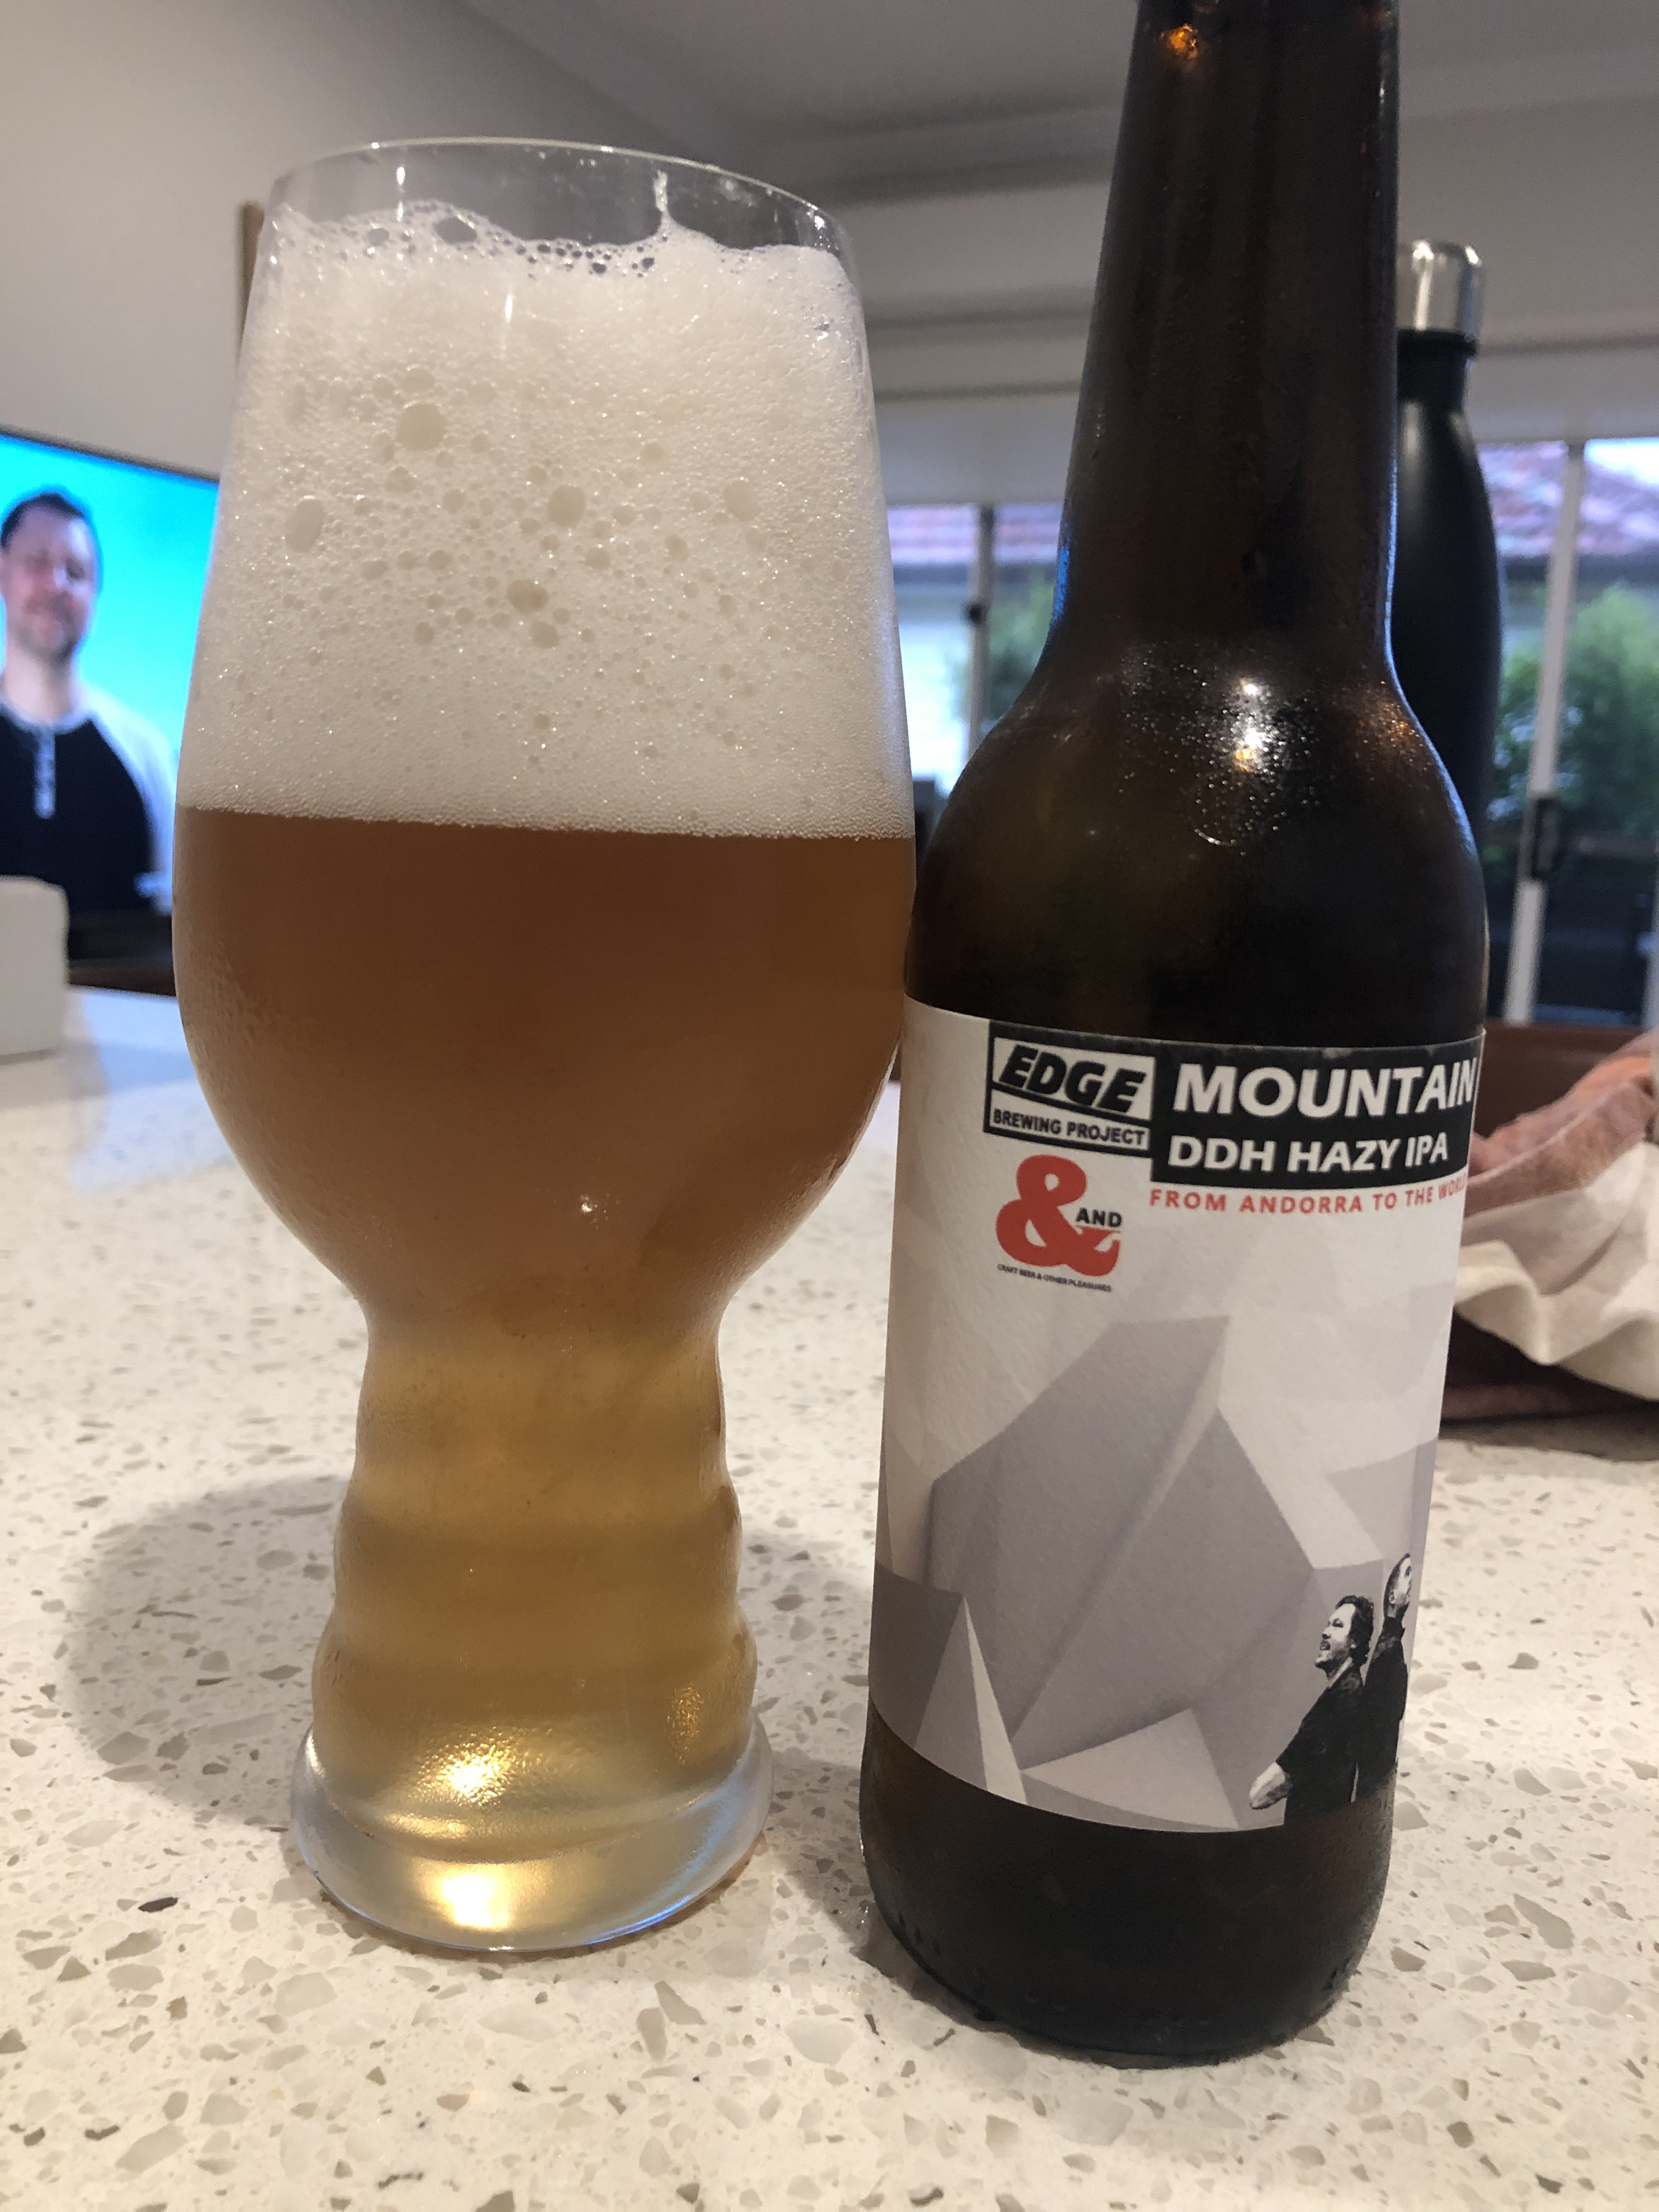 edge brewing mountain DDH hazy IPA